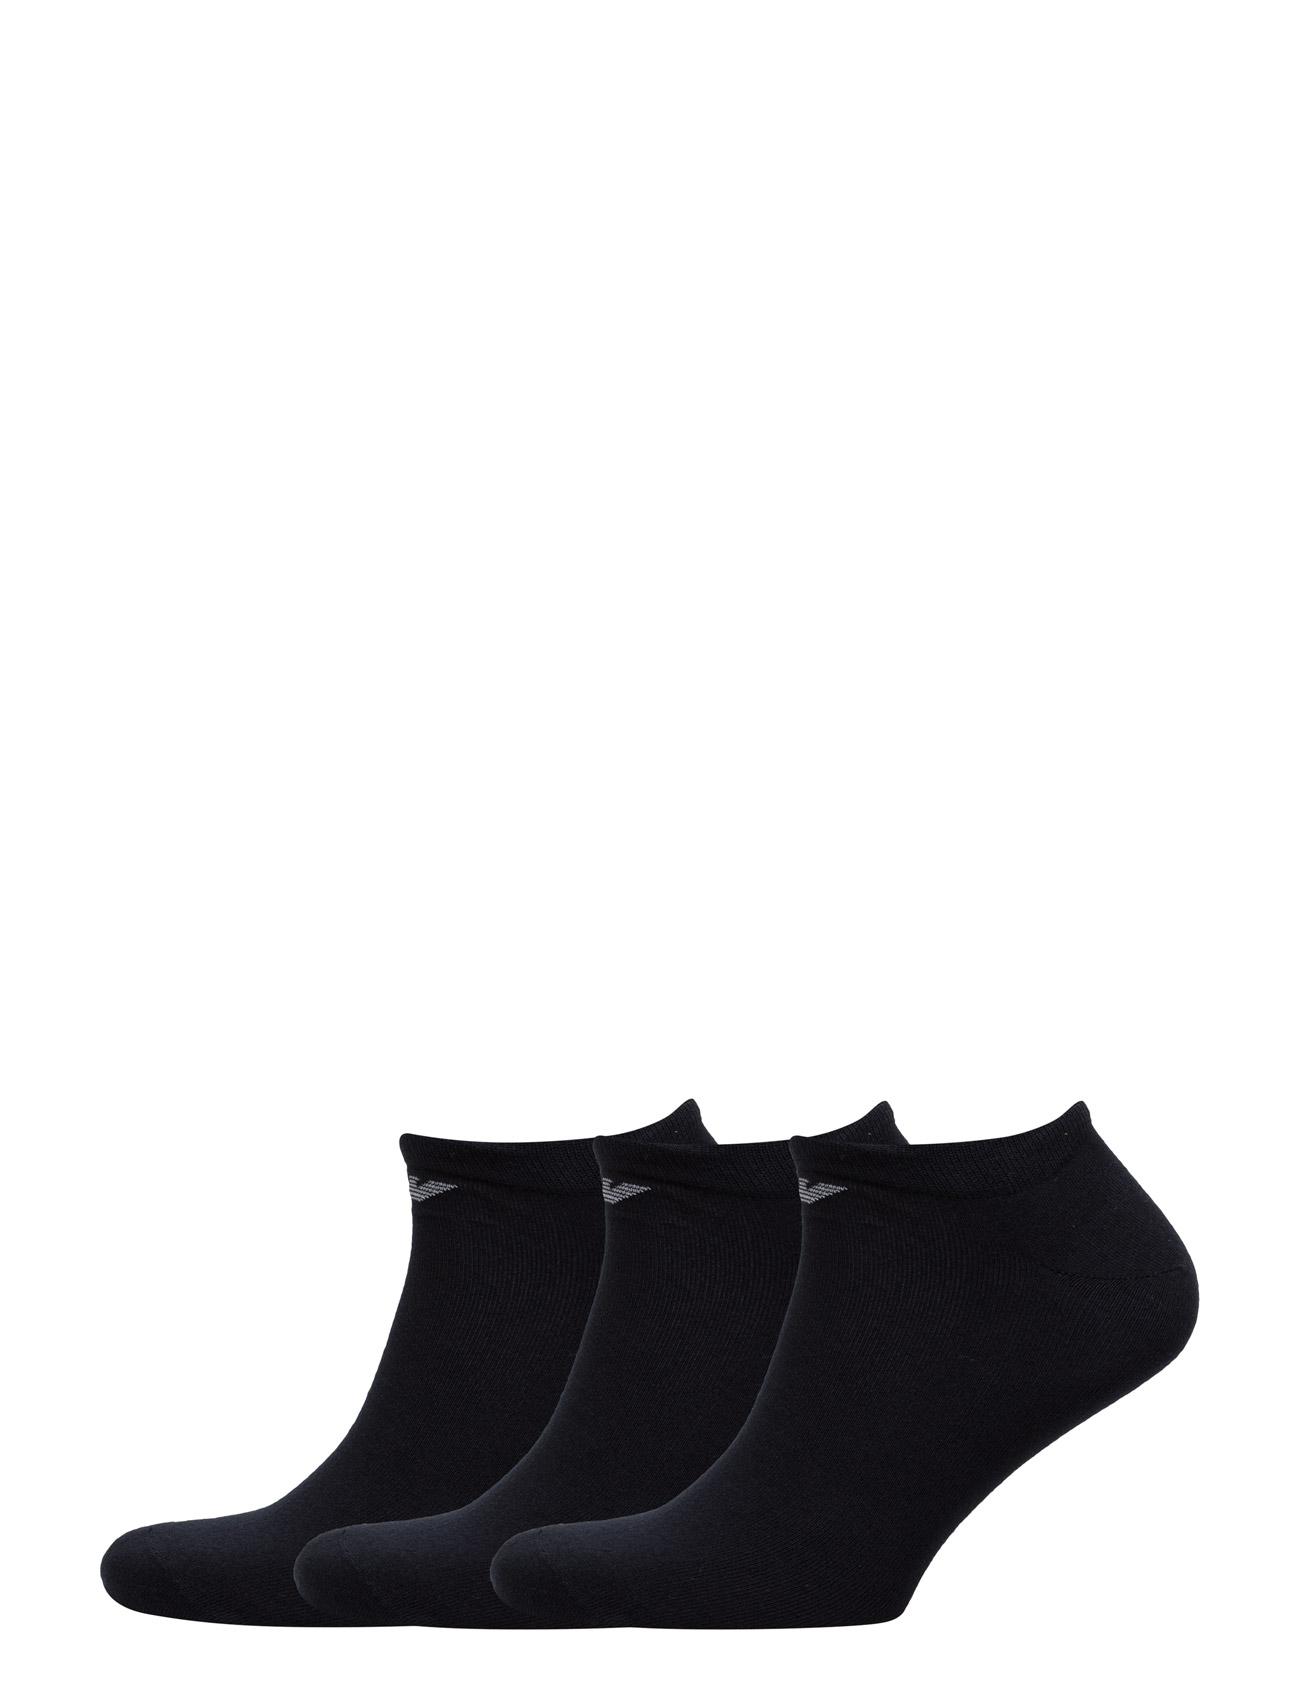 emporio armani – Men's knit in-shoe s fra boozt.com dk